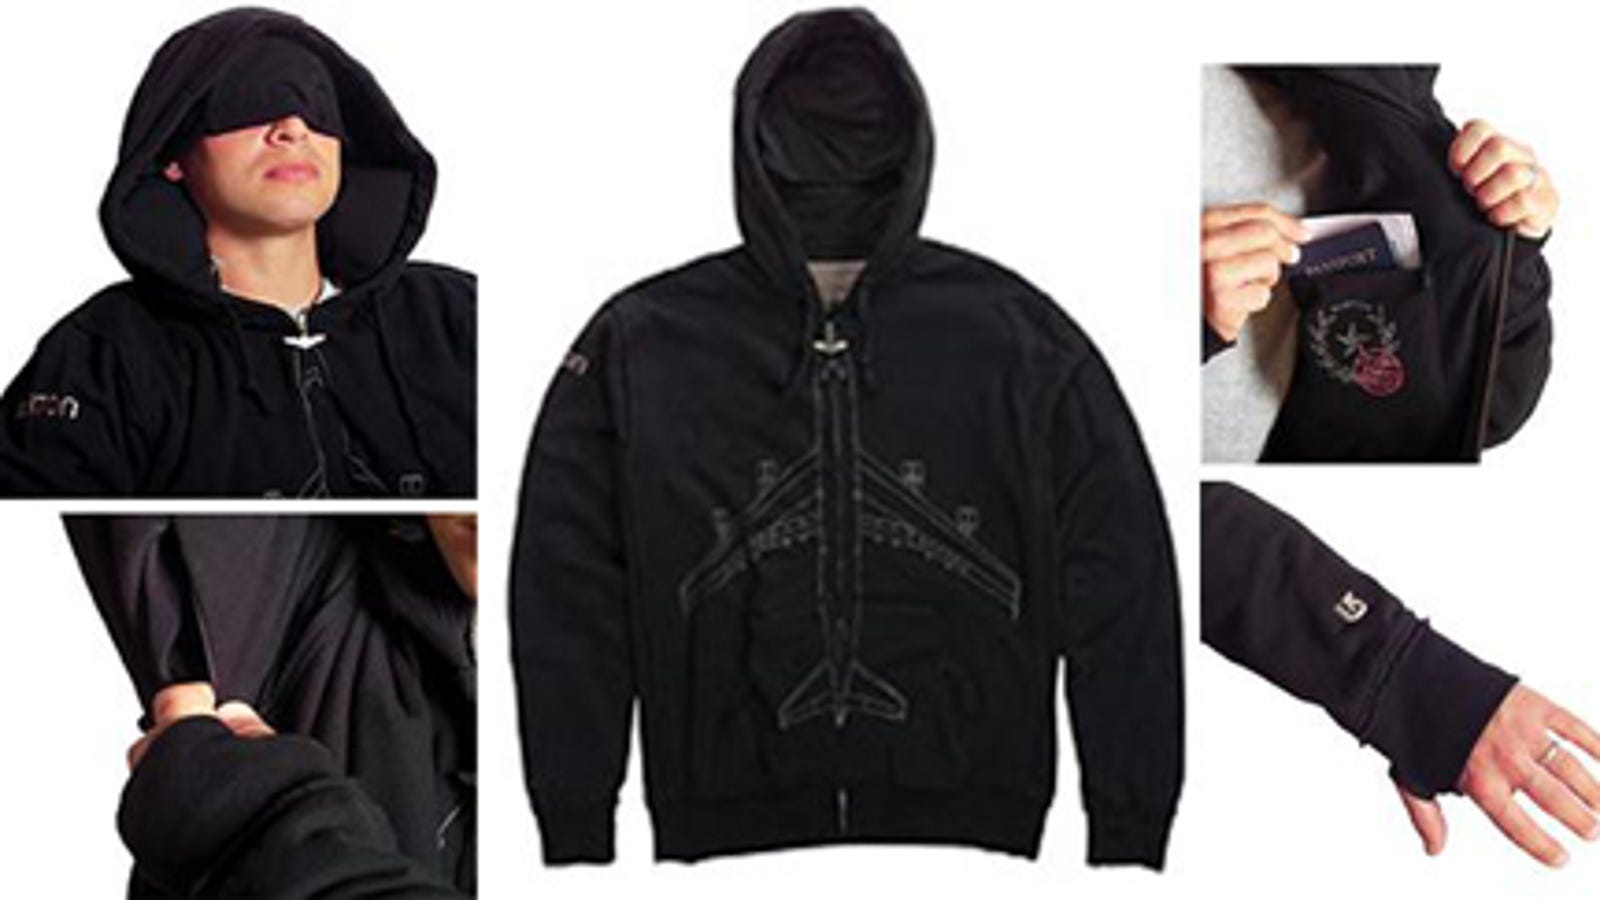 saldi online sleeper hoodie navajofelpa set snowboard custom black coprispalla recensione giacca burton donna covertoutlet giacche p radar shop jet mocha da sleepergiacca amp